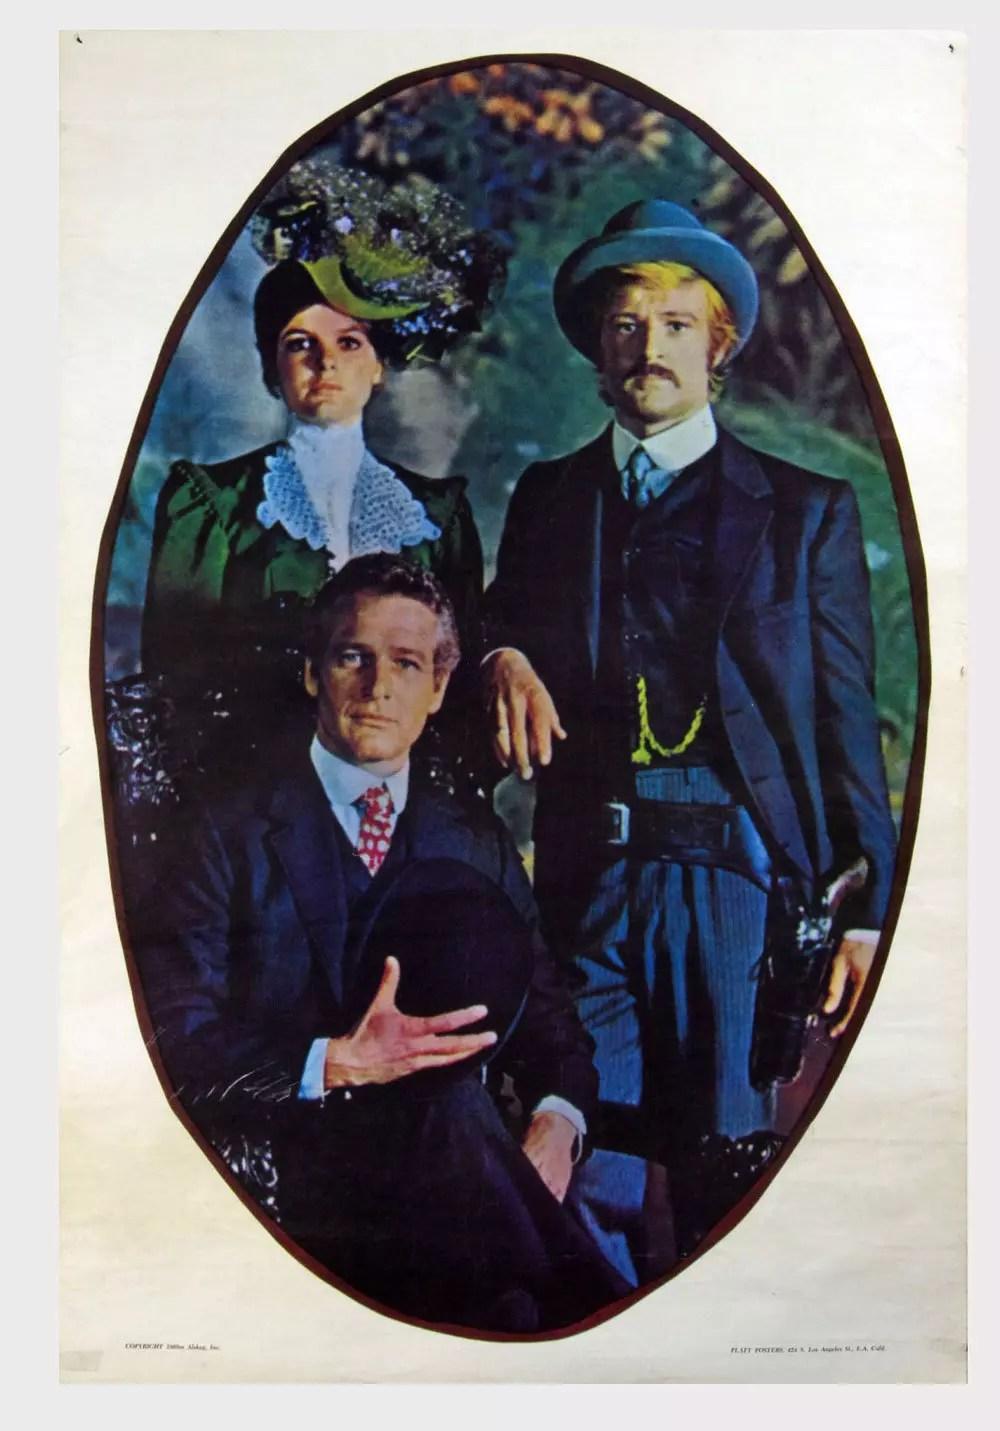 Paul Newman Robert Redford Katharine Hepburn Poster 1969 28 x 42 Condition Fine